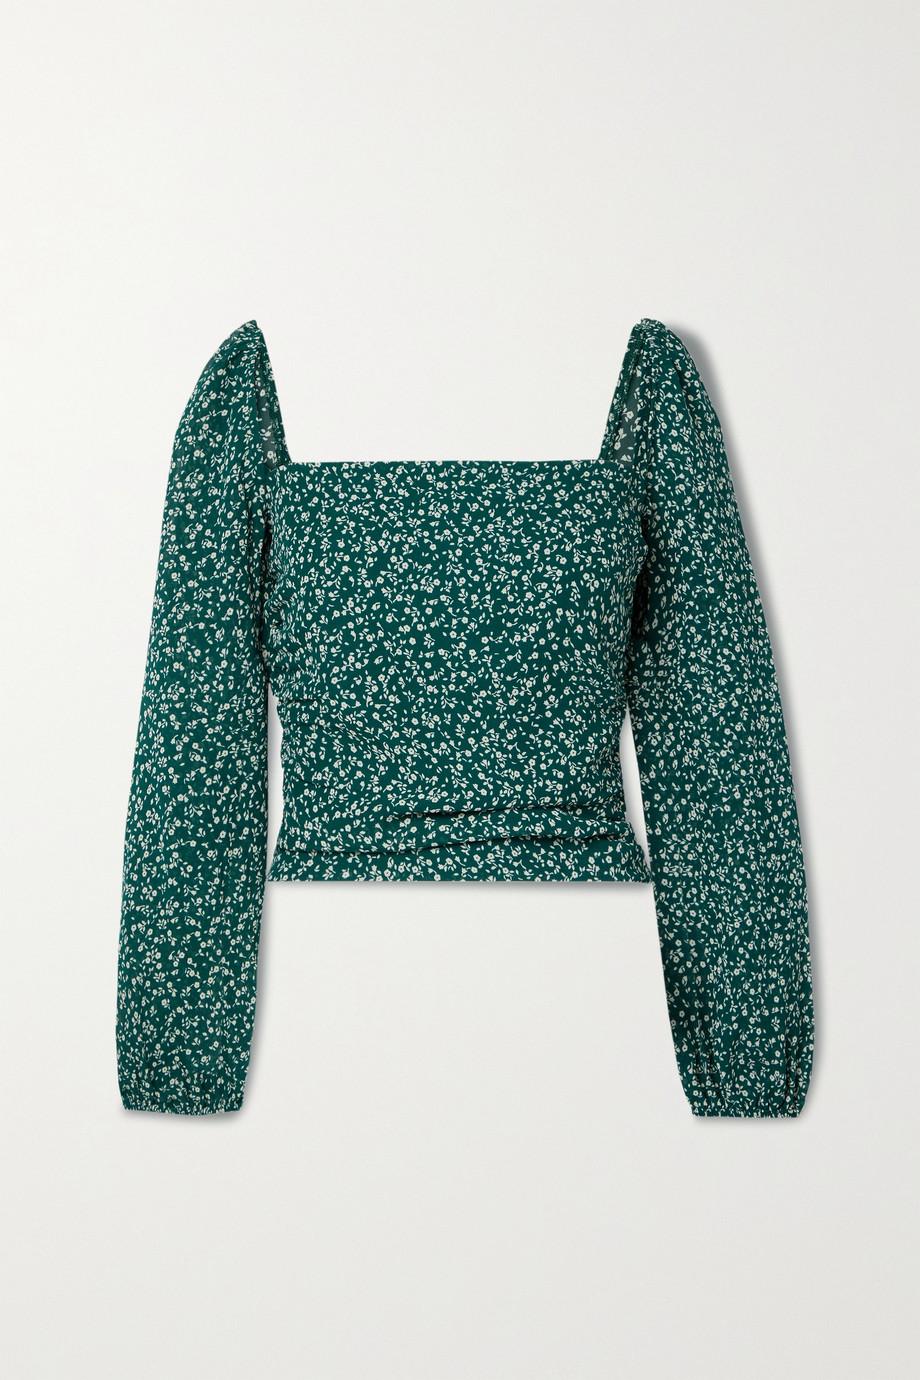 Reformation Olio shirred floral-print georgette top